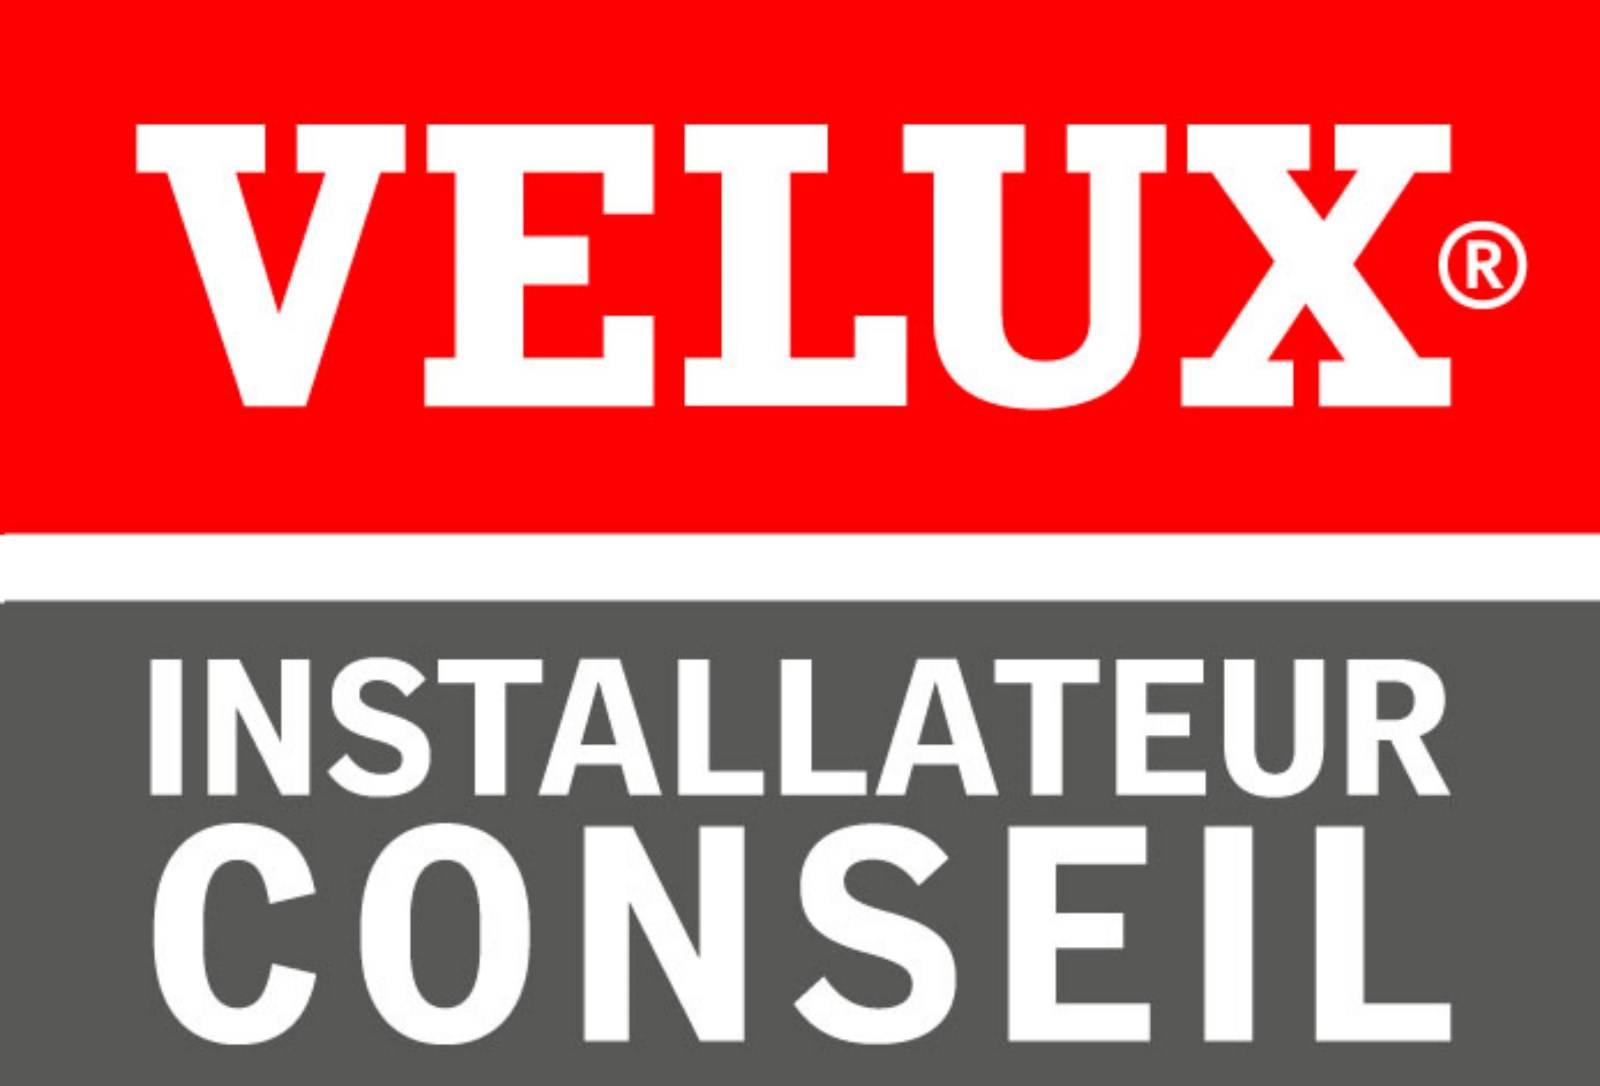 Artim MENUISIER CHOLET Installateur Conseil Velux 174